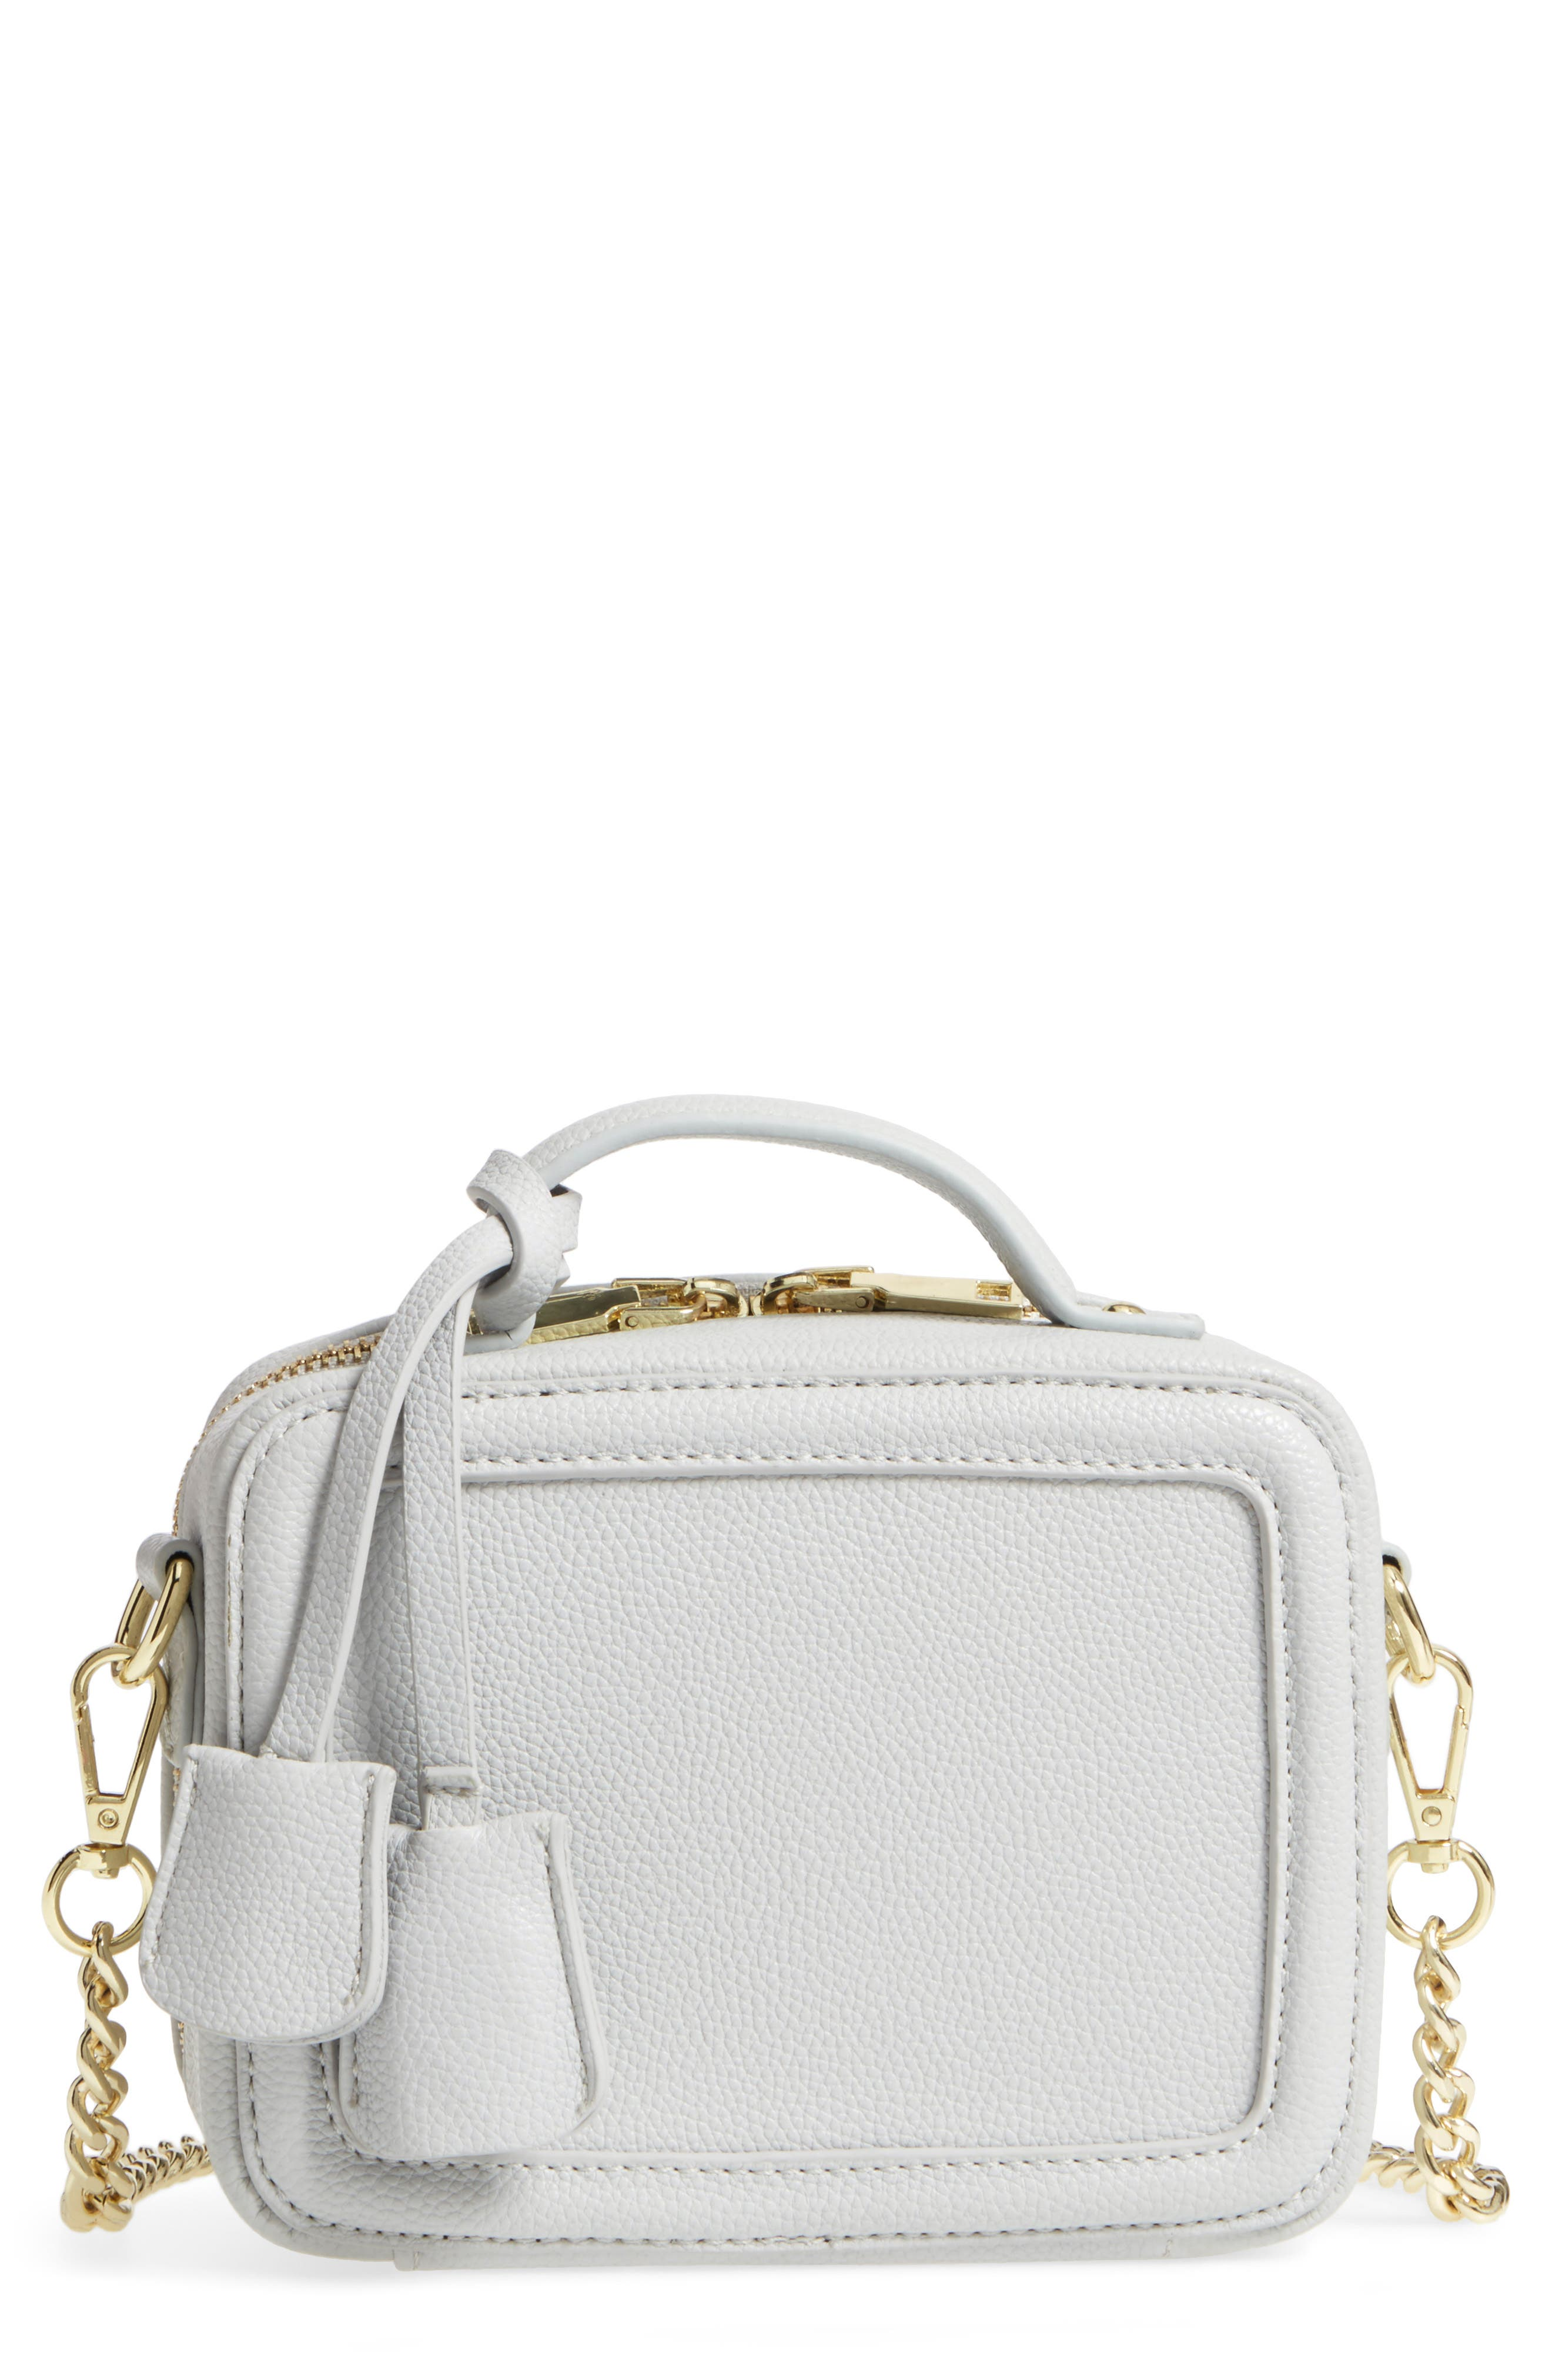 Taylor Faux Leather Crossbody Bag,                             Main thumbnail 1, color,